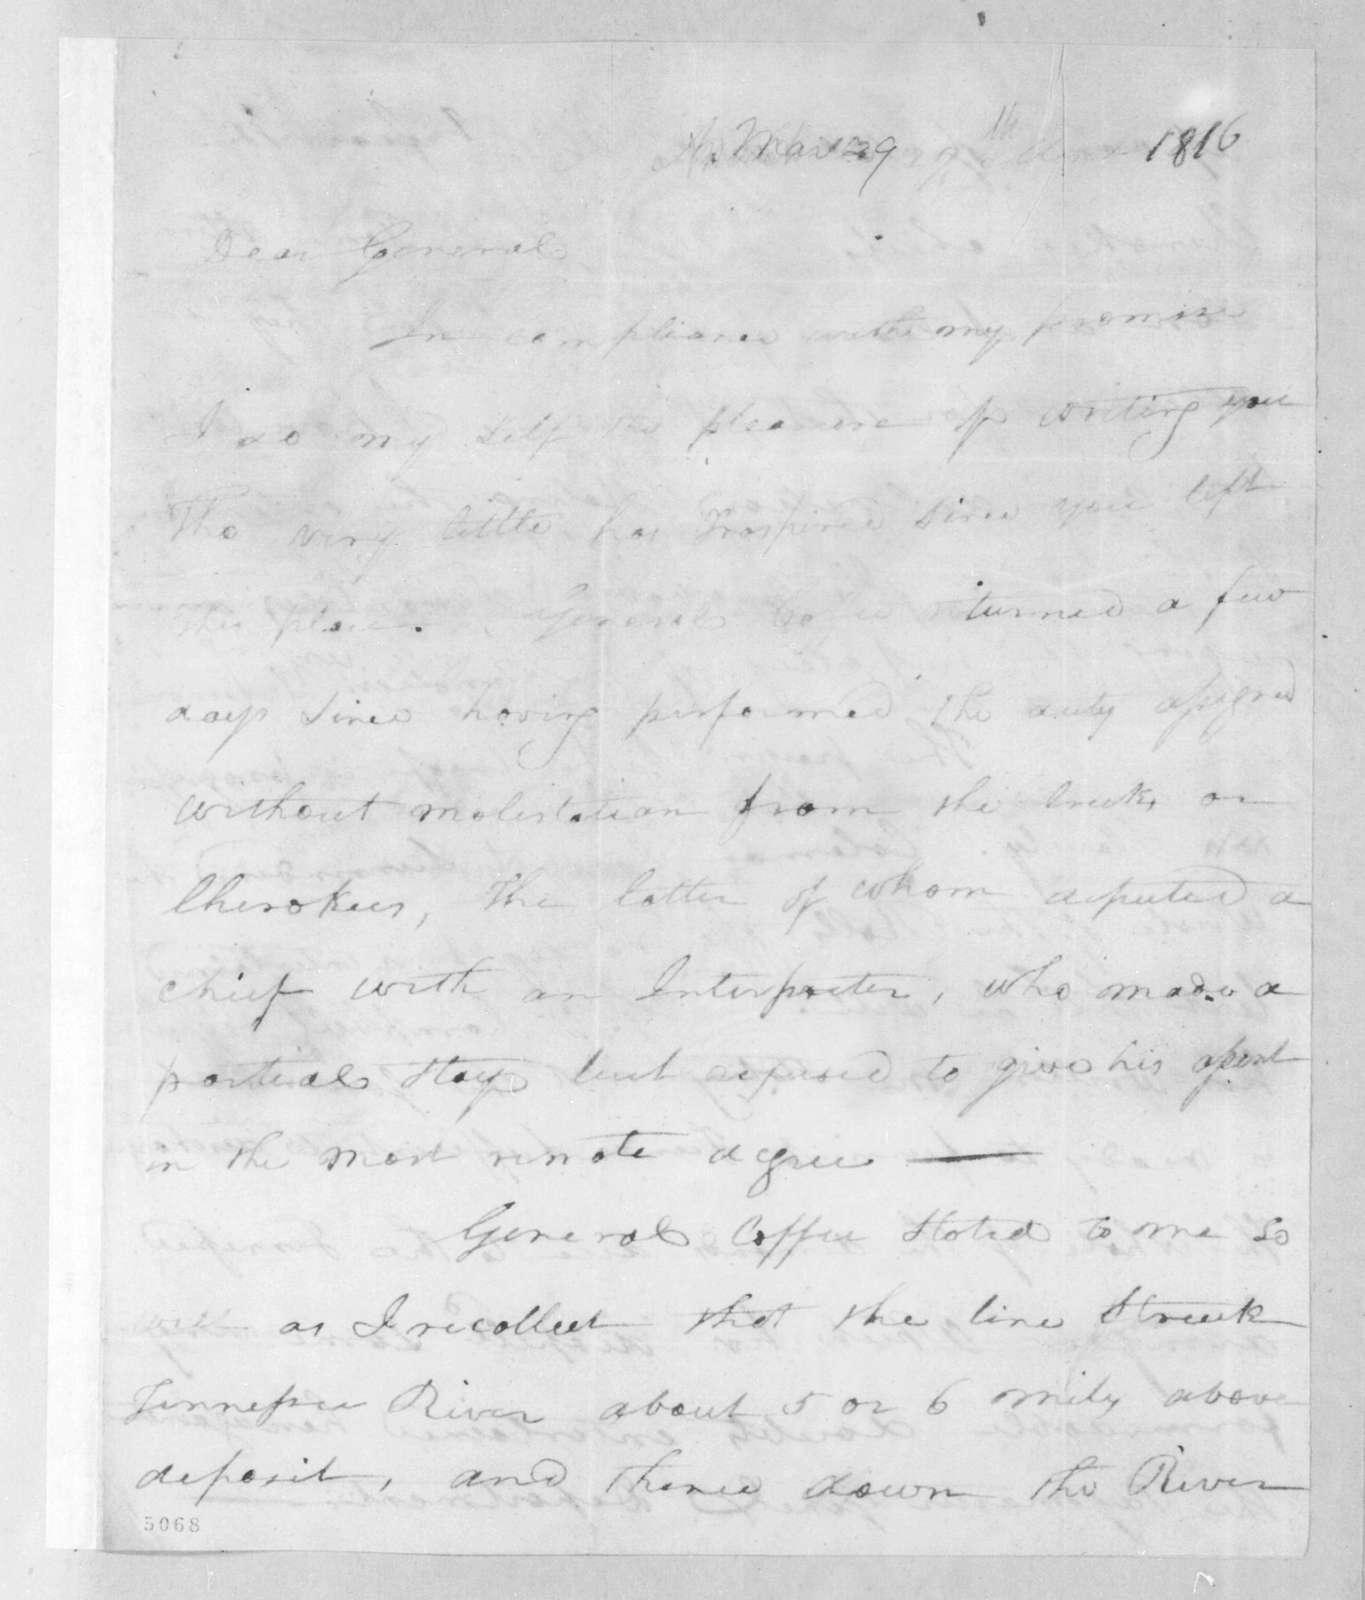 Joseph McMinn to Andrew Jackson, March 29, 1816